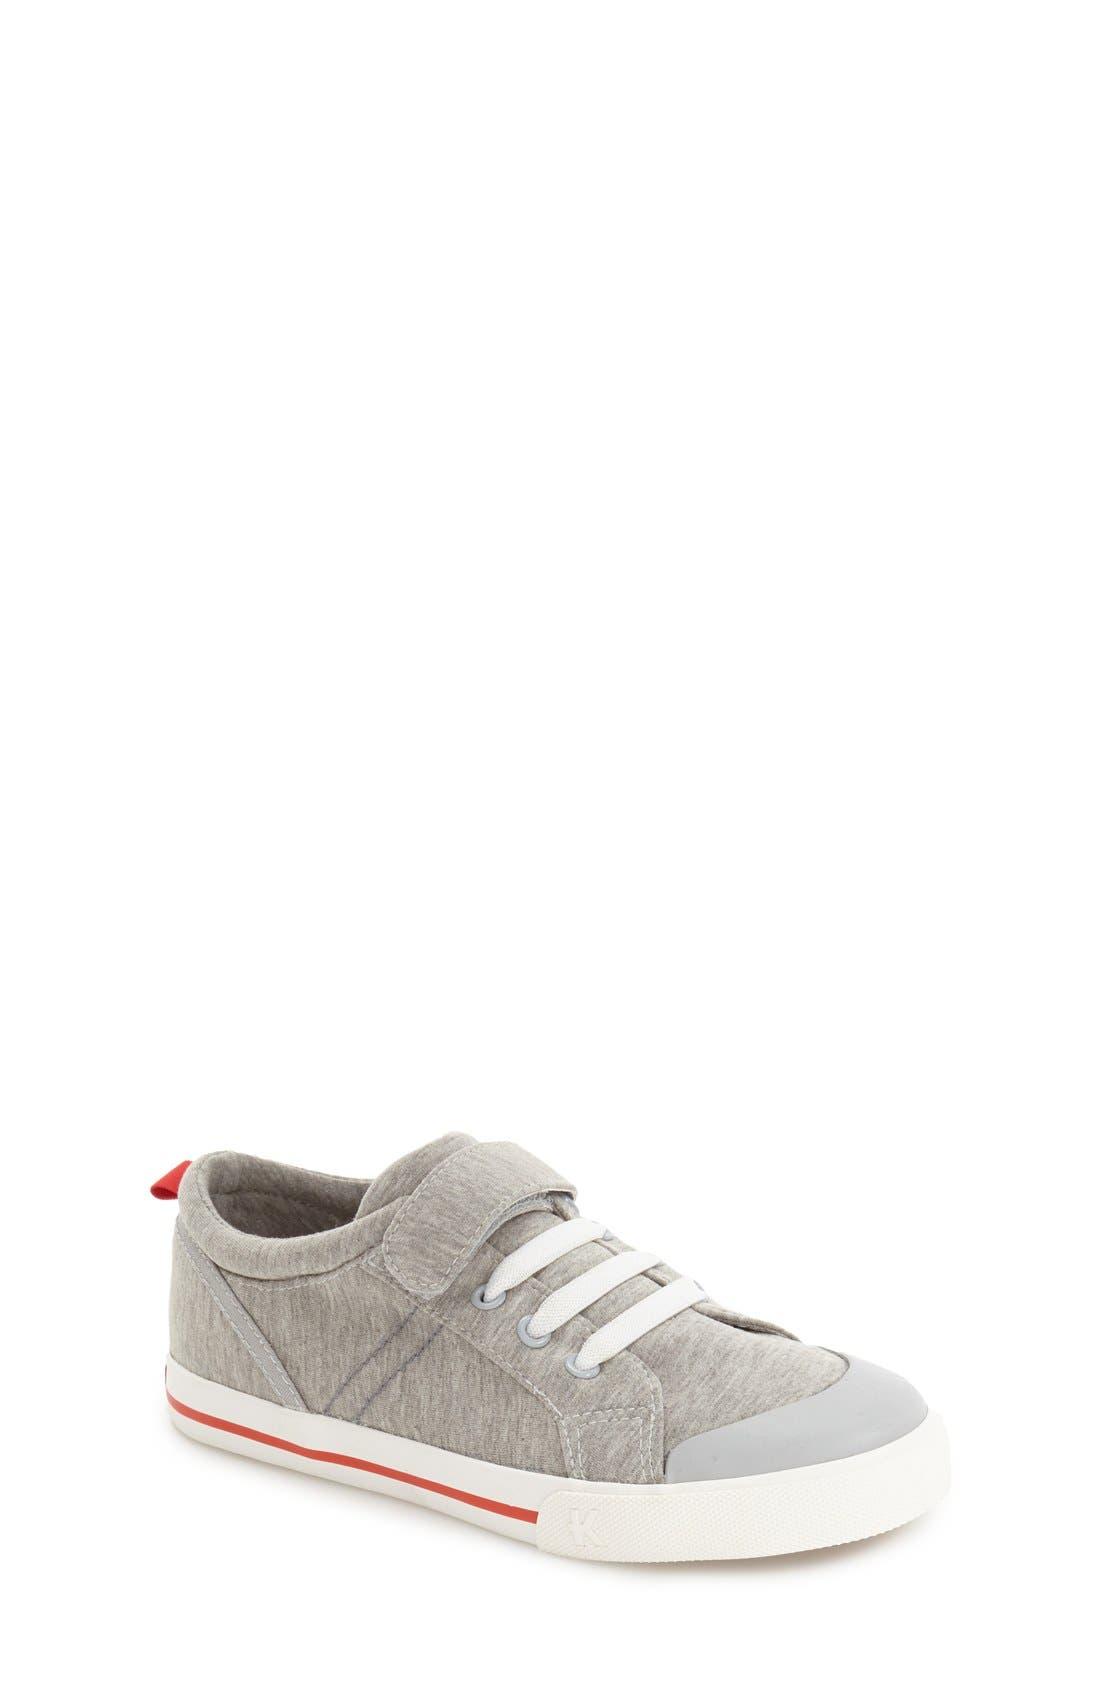 SEE KAI RUN 'Tanner' Sneaker